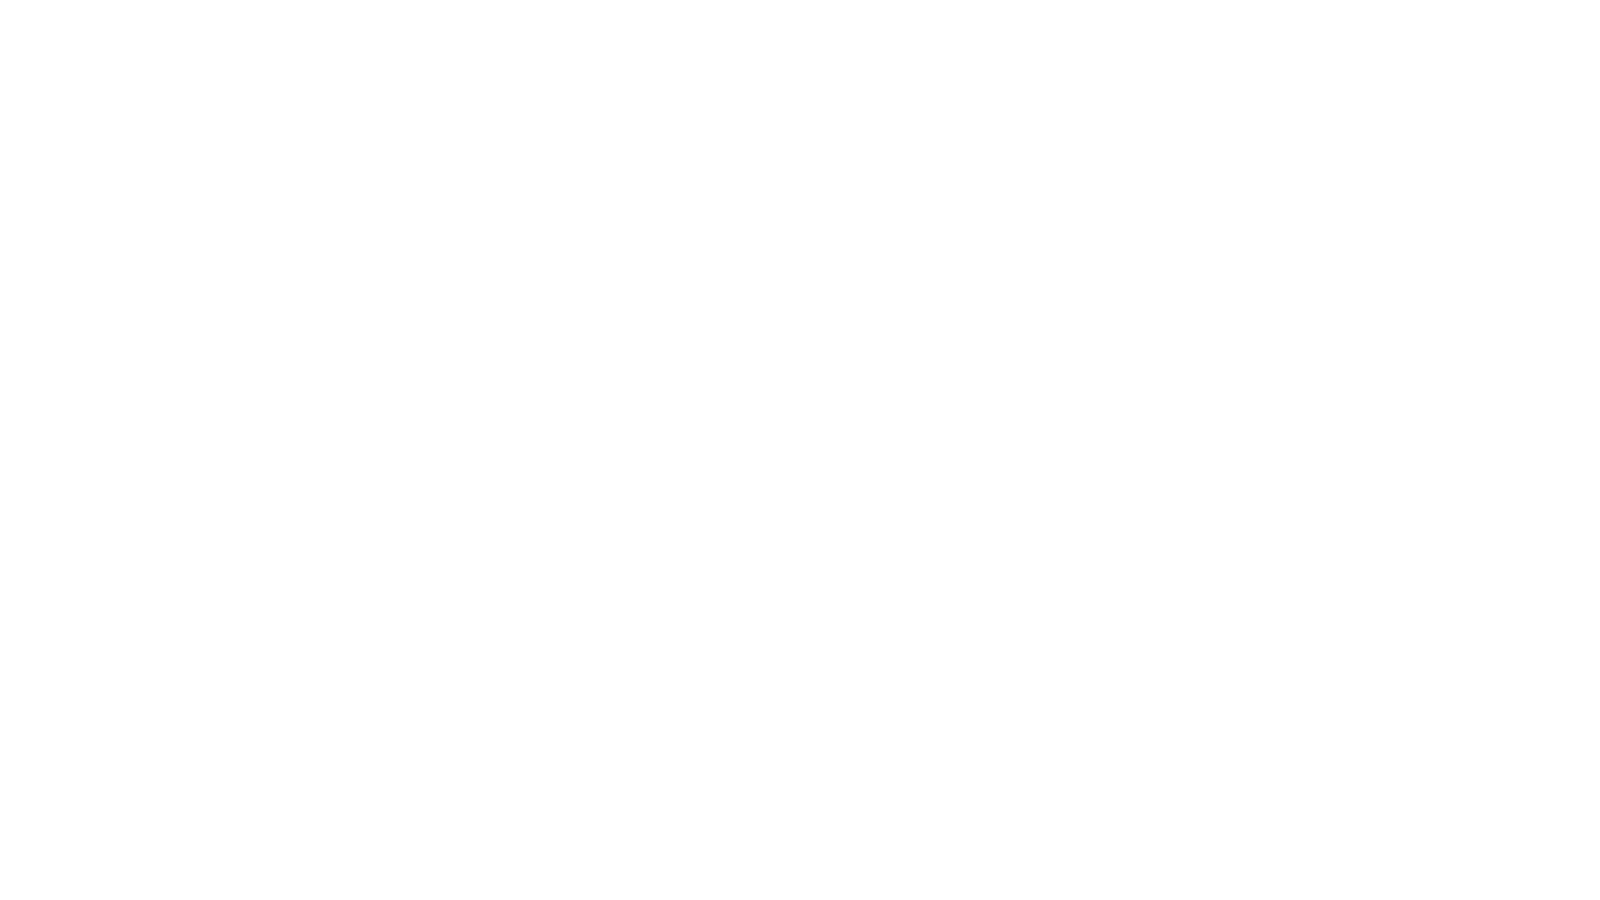 обследование срубового дома тепловизором. отчёт из 99 снимков. +7-987-440-87-08, Александр https://santehnik63.ru/teplovizor-samara/